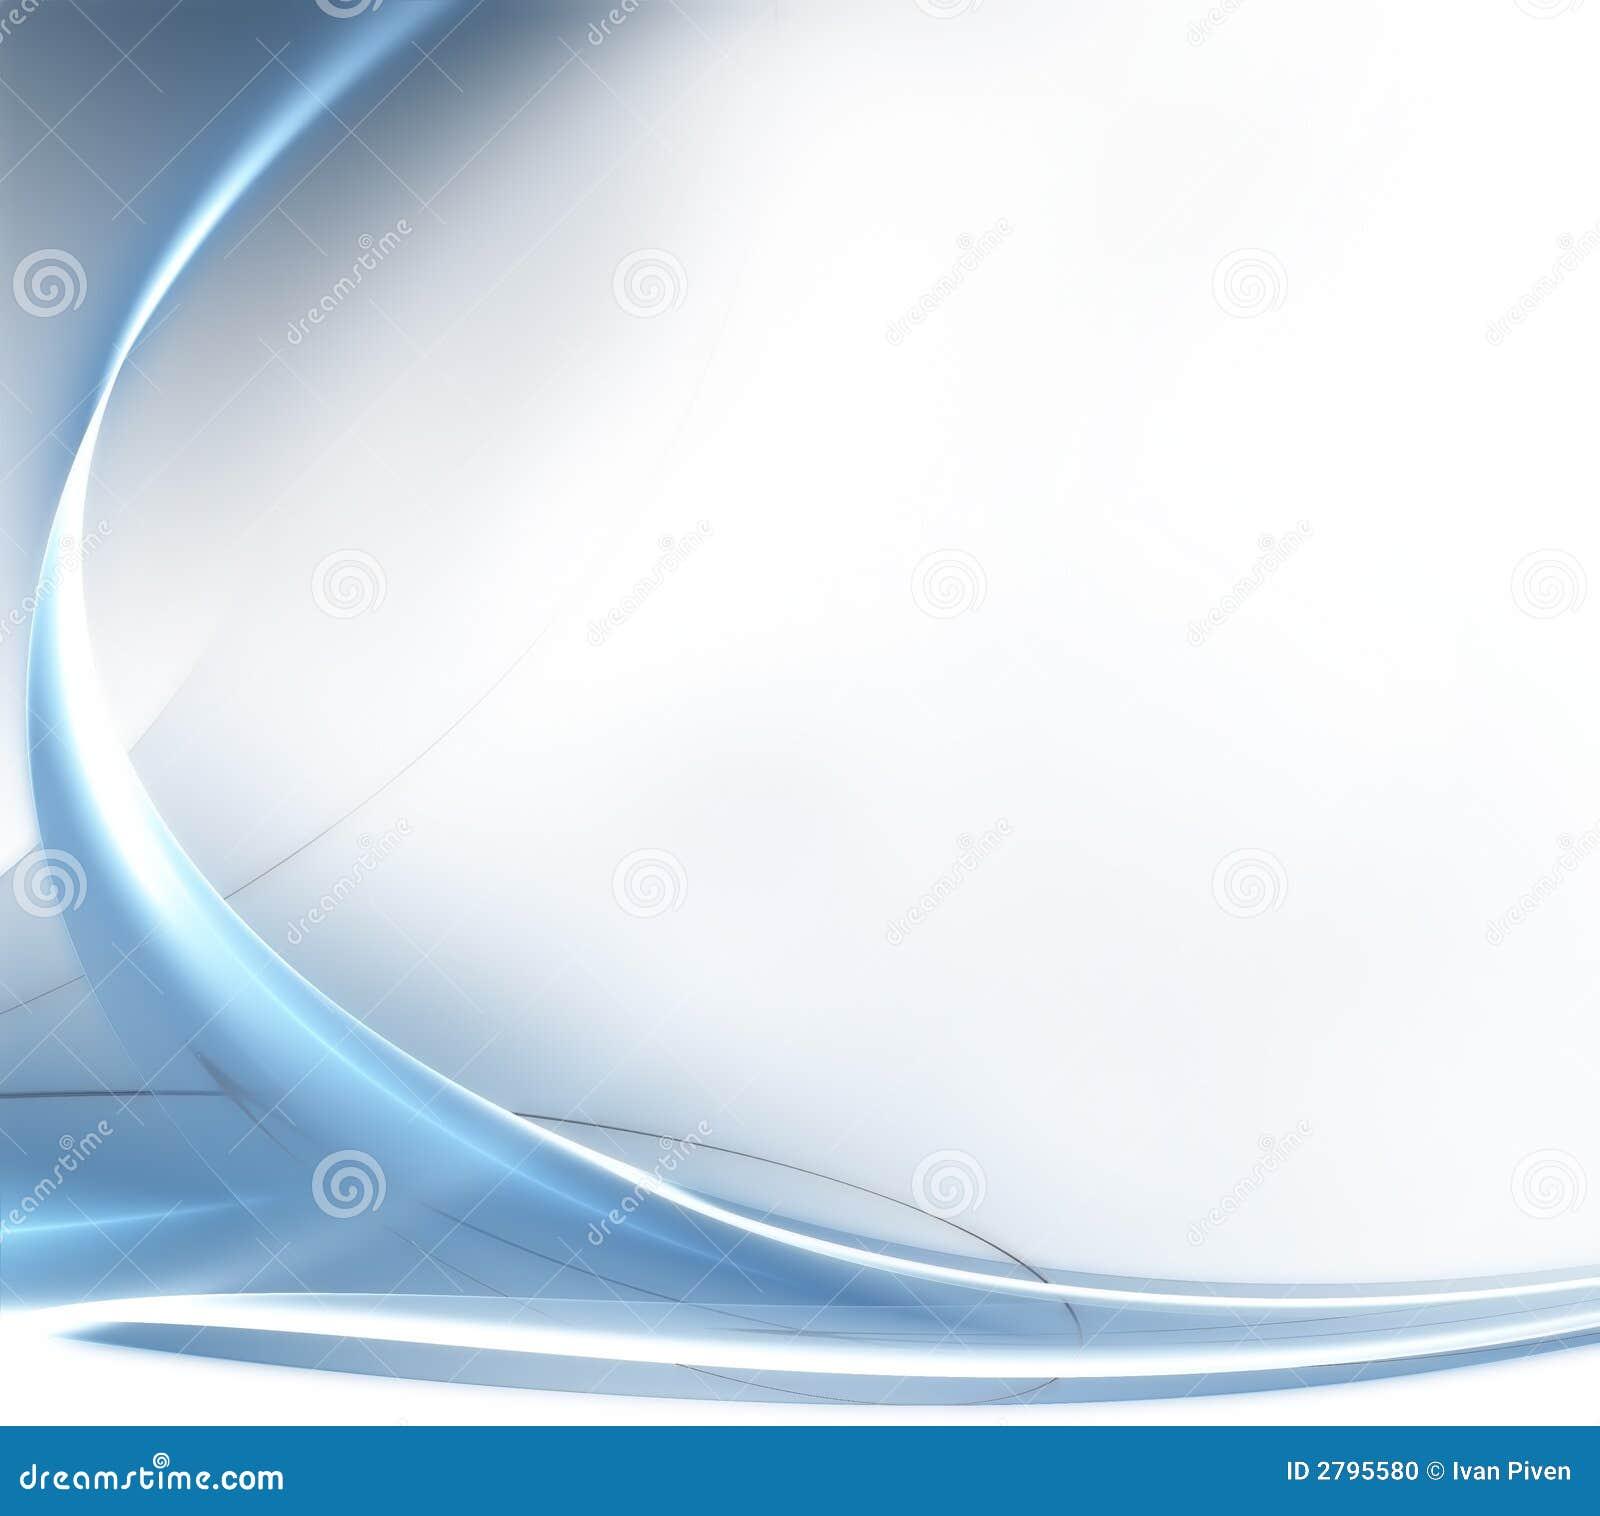 Beautiful design background stock illustration image 2795580 - Beautiful dizain image ...